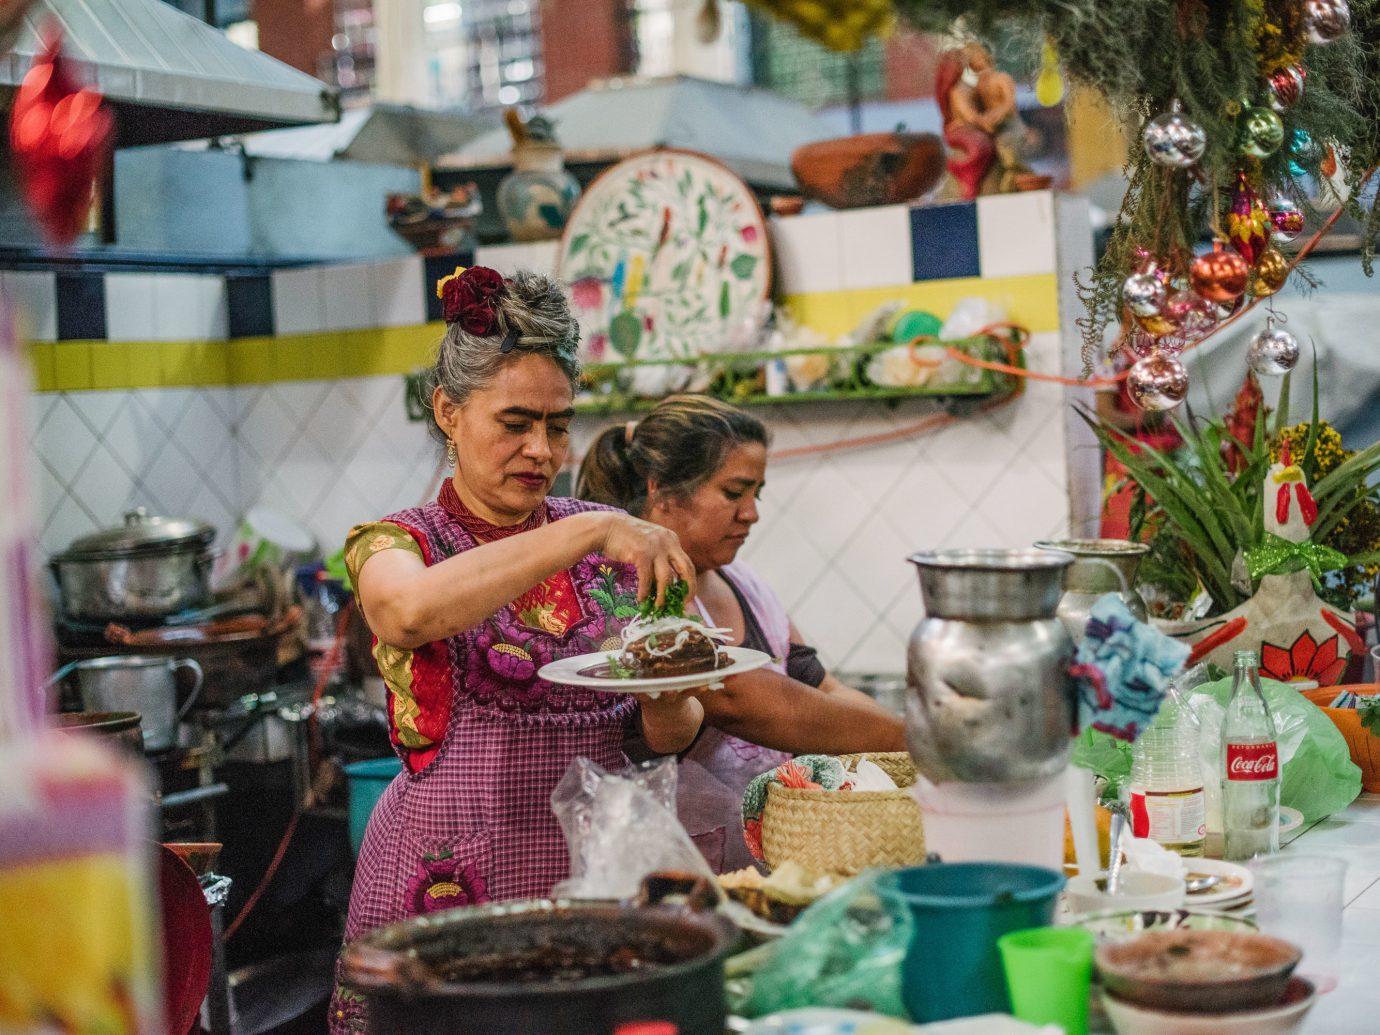 Arts + Culture Mexico Oaxaca Trip Ideas marketplace vendor market food street food bazaar stall produce recreation